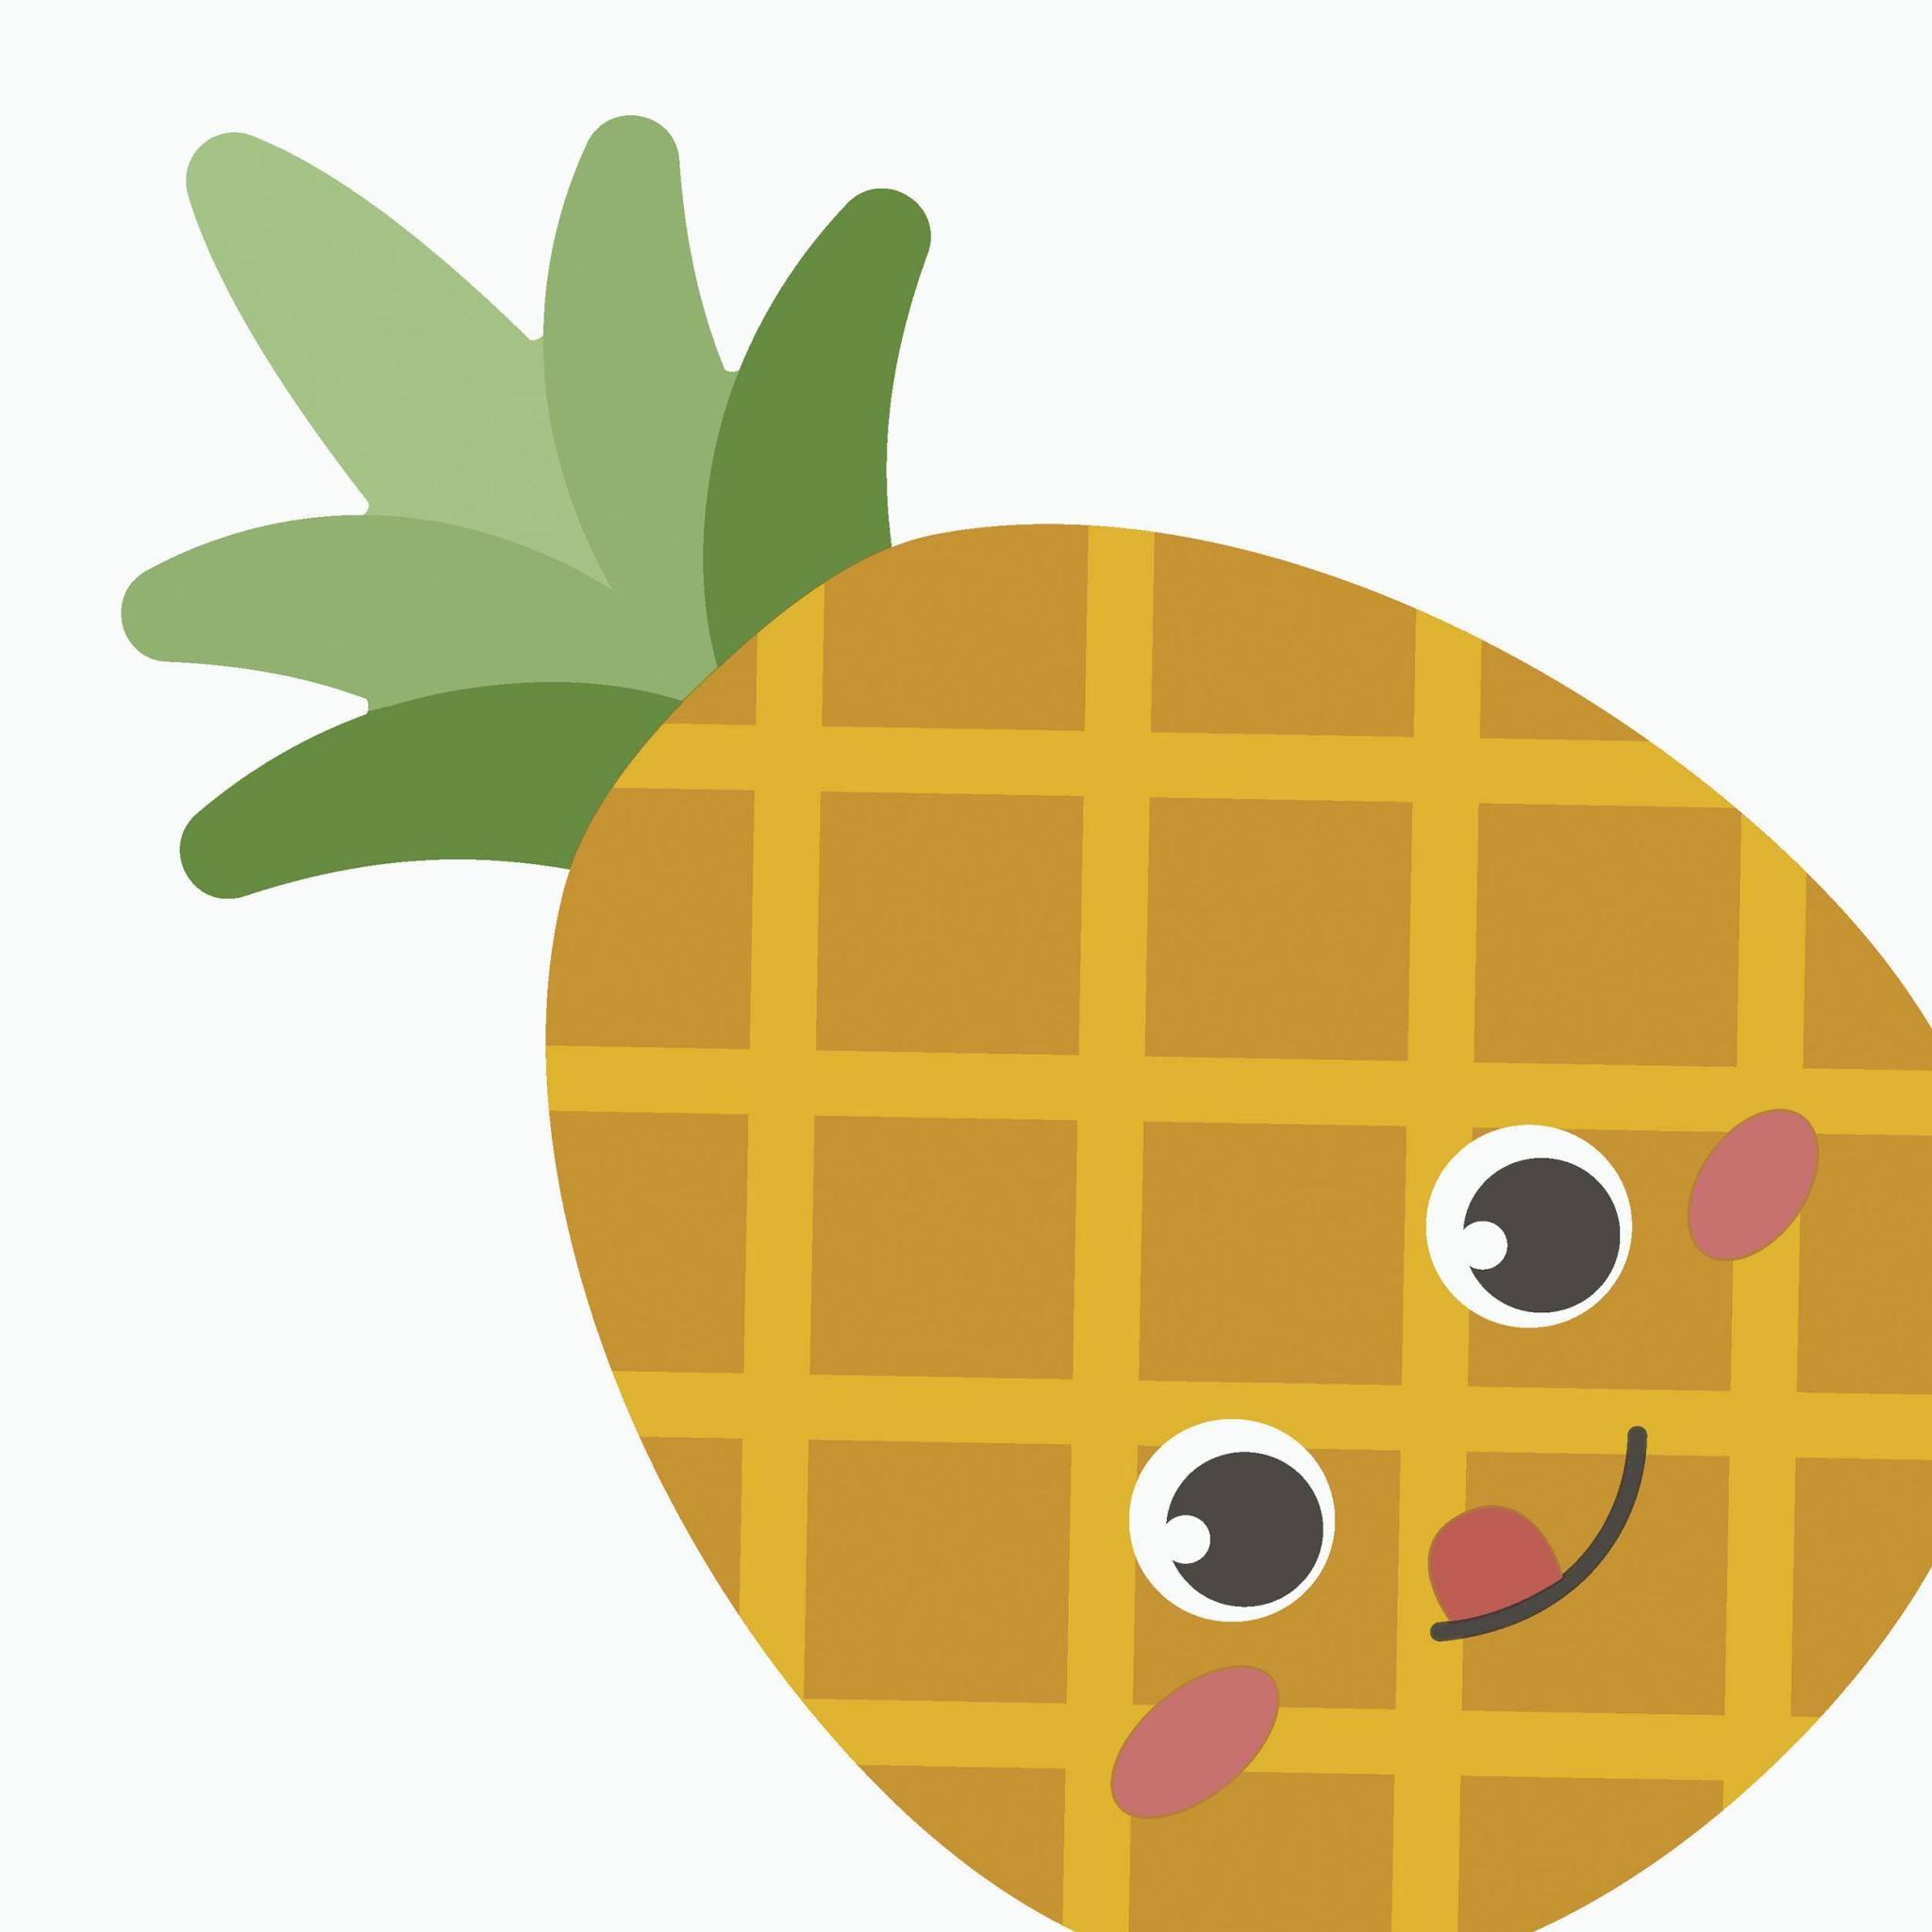 Servilletas troqueladas - Silhouettes Pineapple